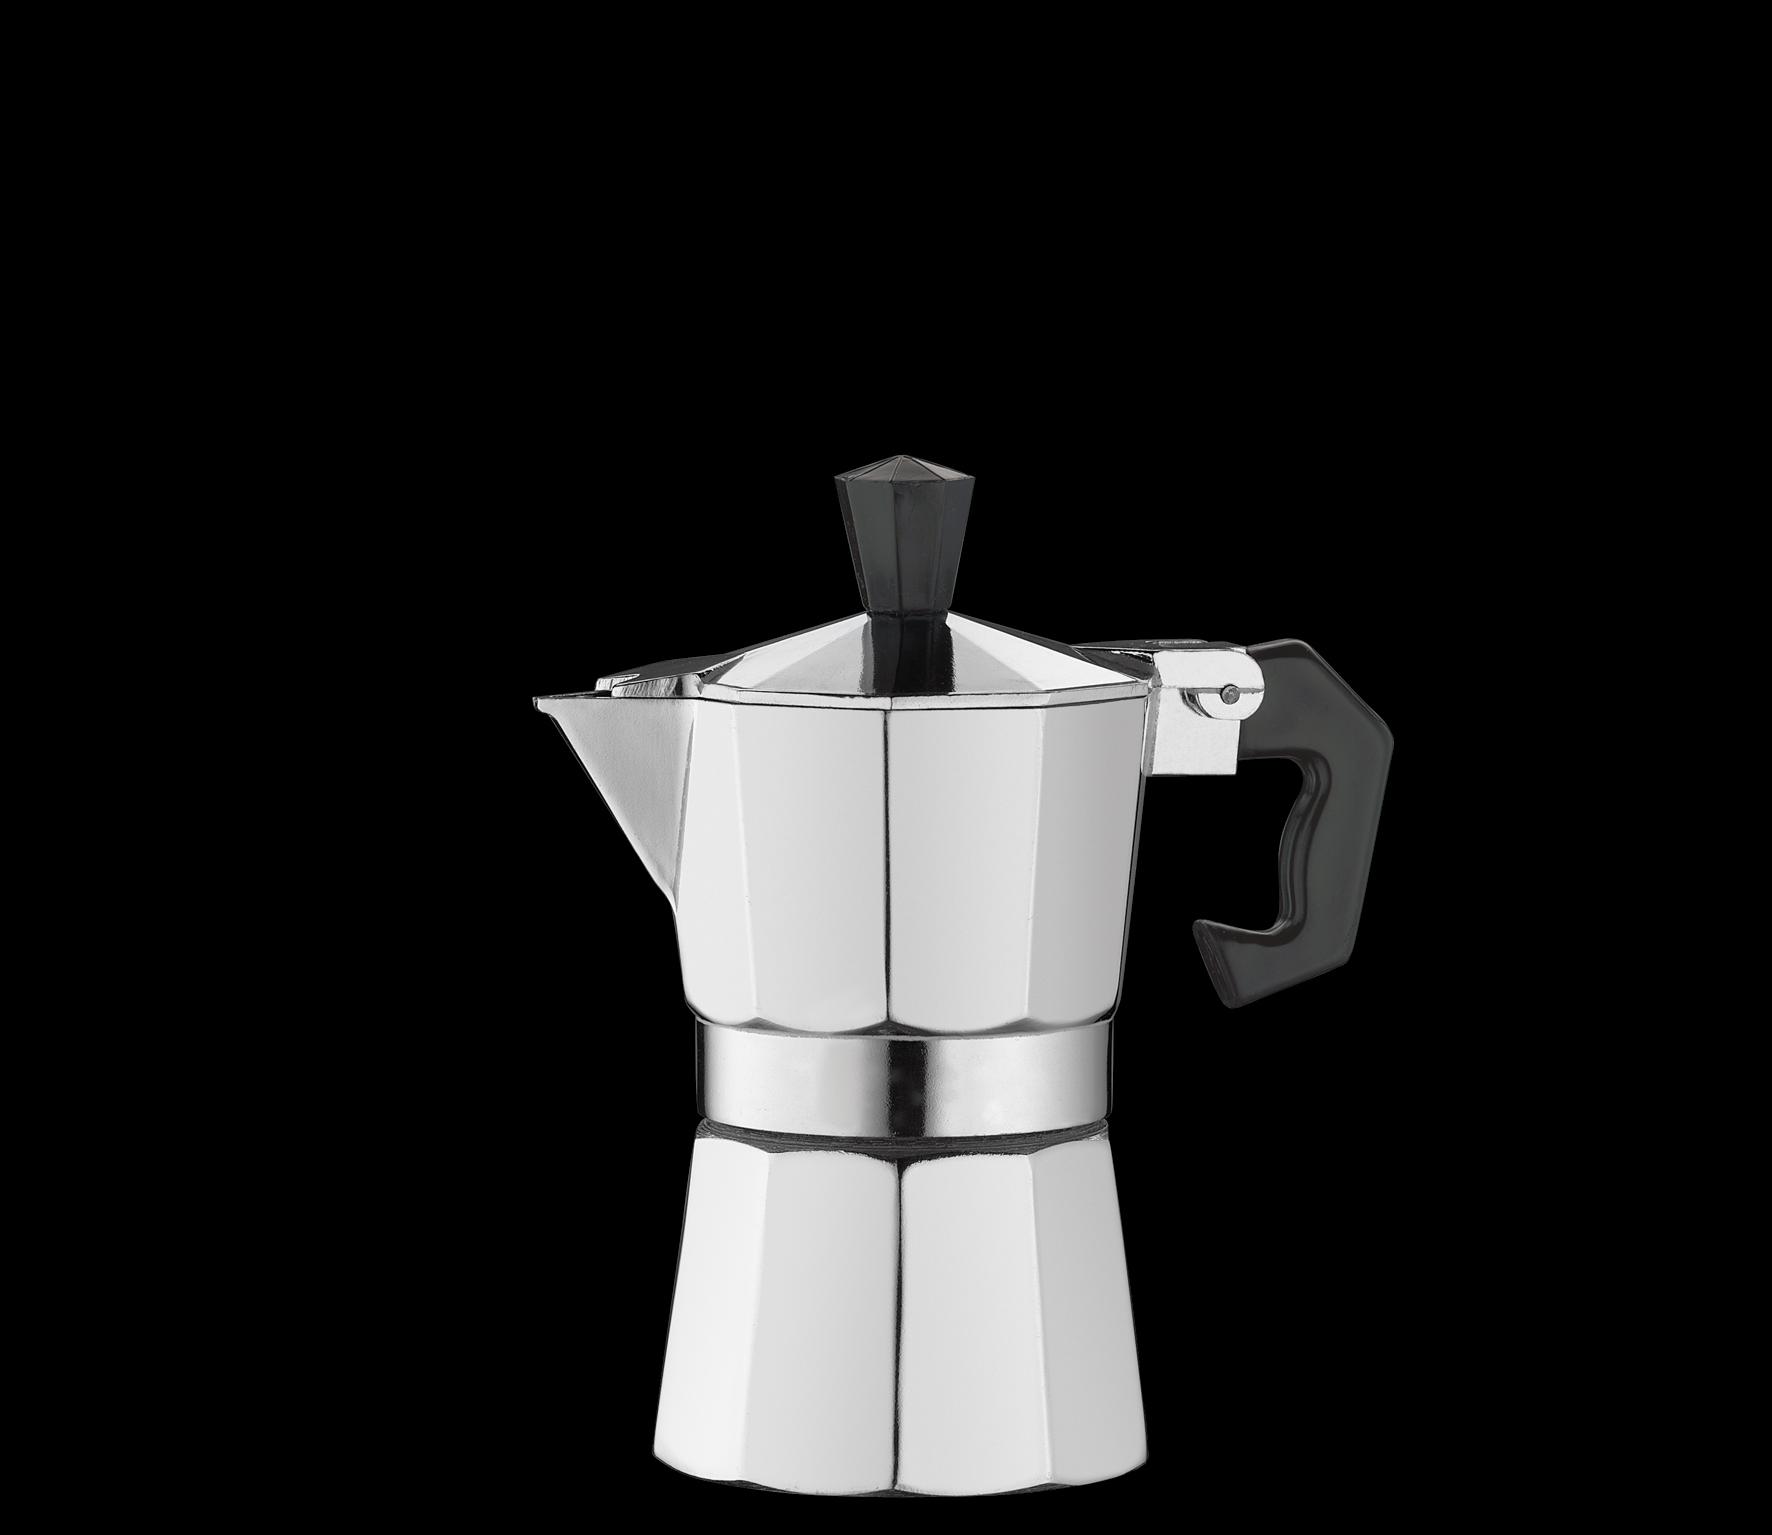 Kávovar espressa Classico Moka express 1 šálek 50 ml - Cilio